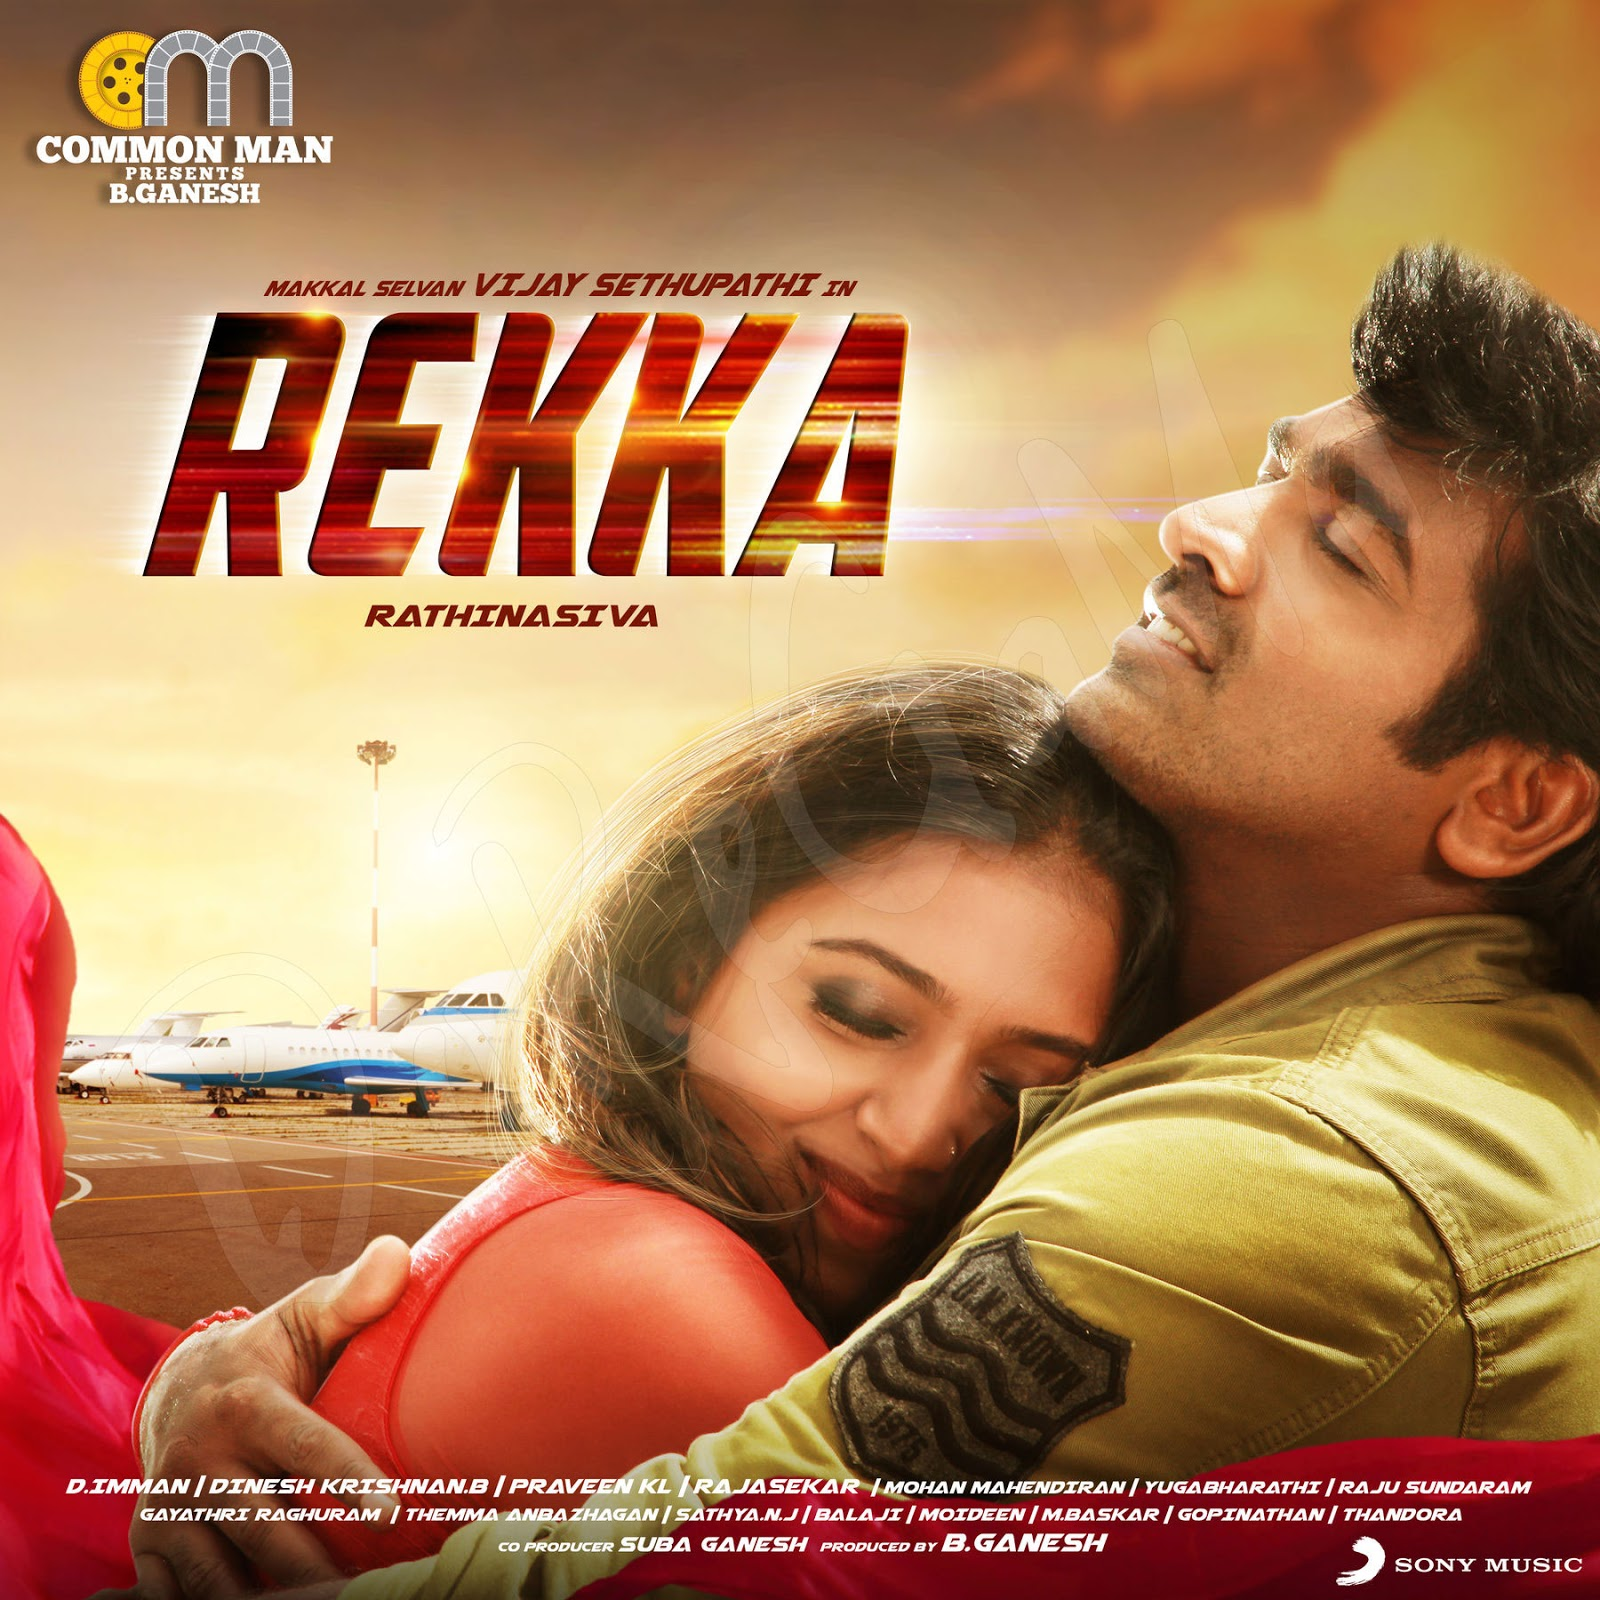 Rekka--2016-Movie-Songs-CD-Front-Cover-Poster-wallpaper-HD